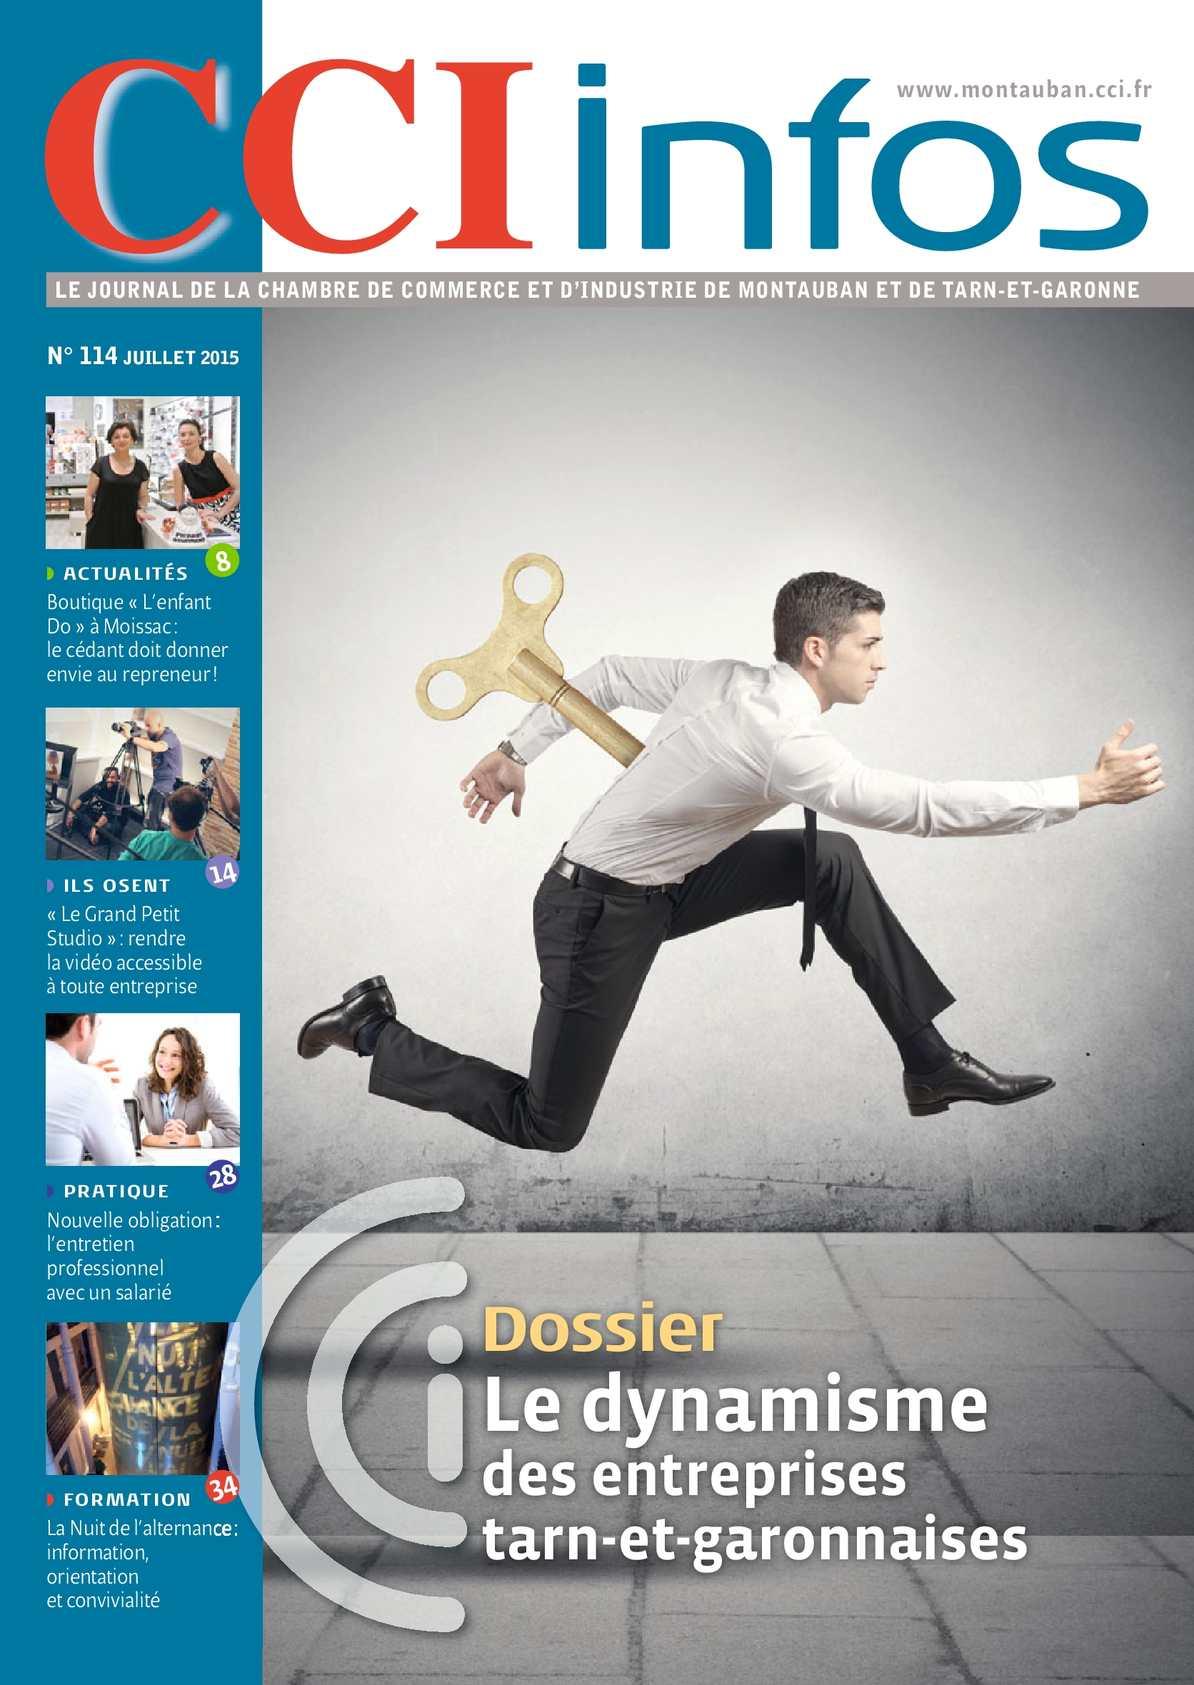 Calam o cci infos juillet 2015 114 for Chambre de commerce montauban